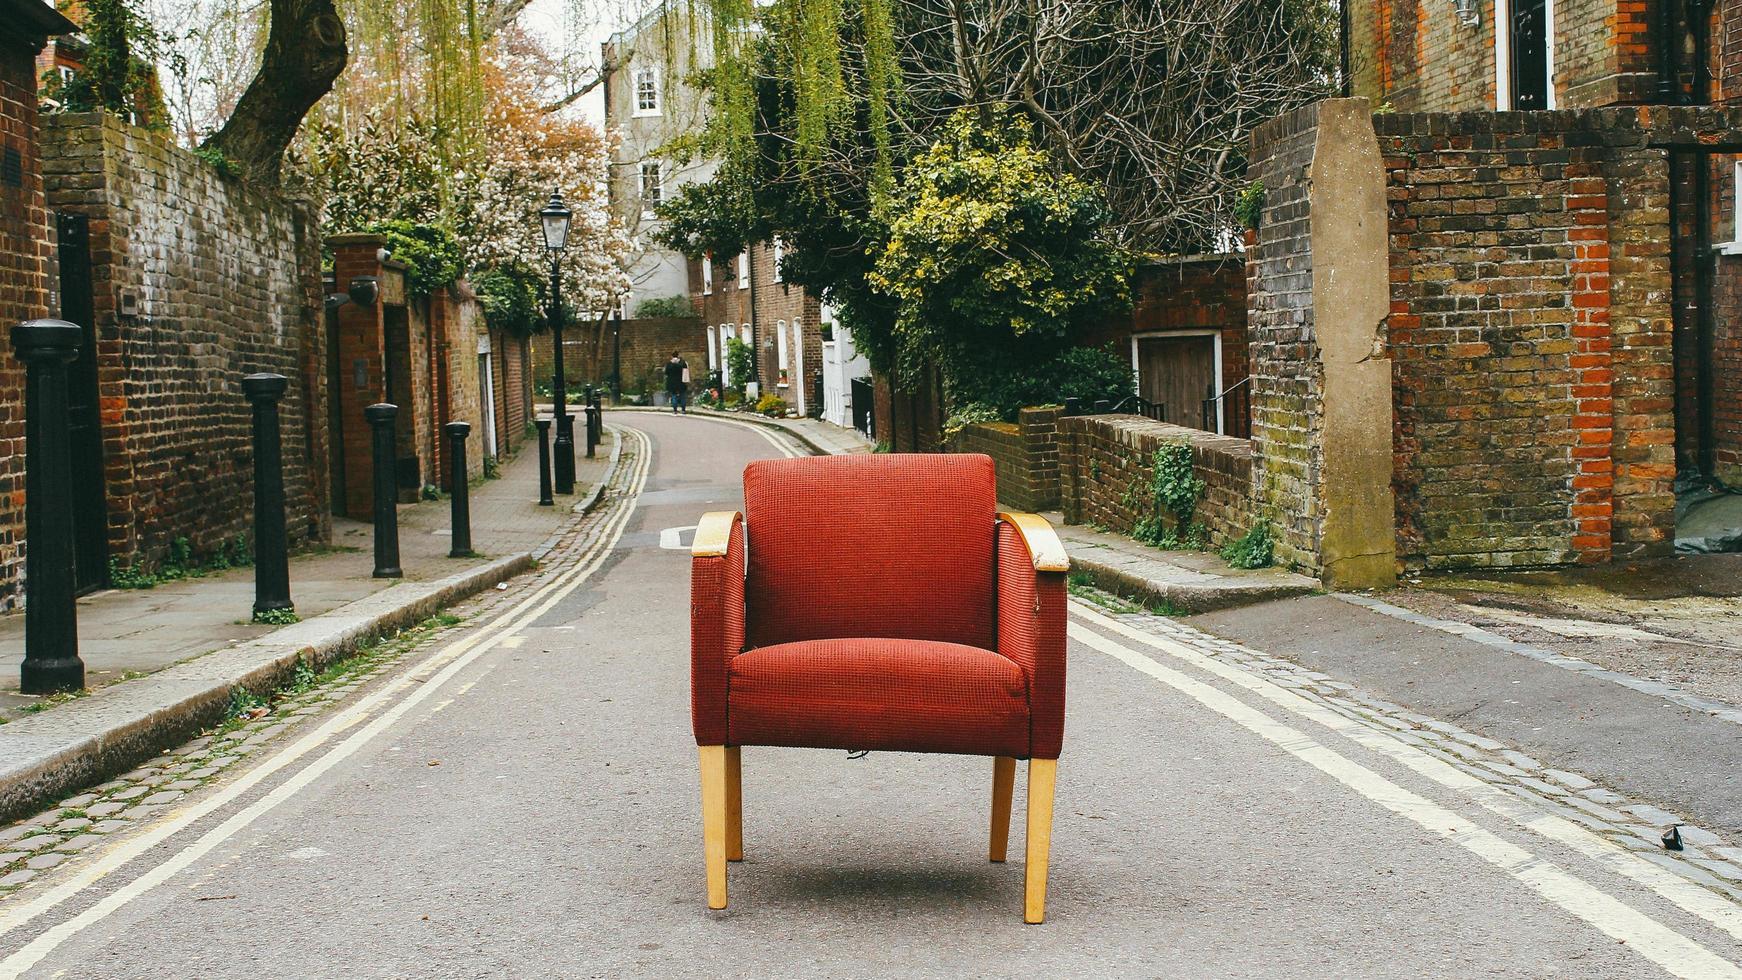 Londres, Reino Unido, 2020 - silla roja desgastada en la calle foto